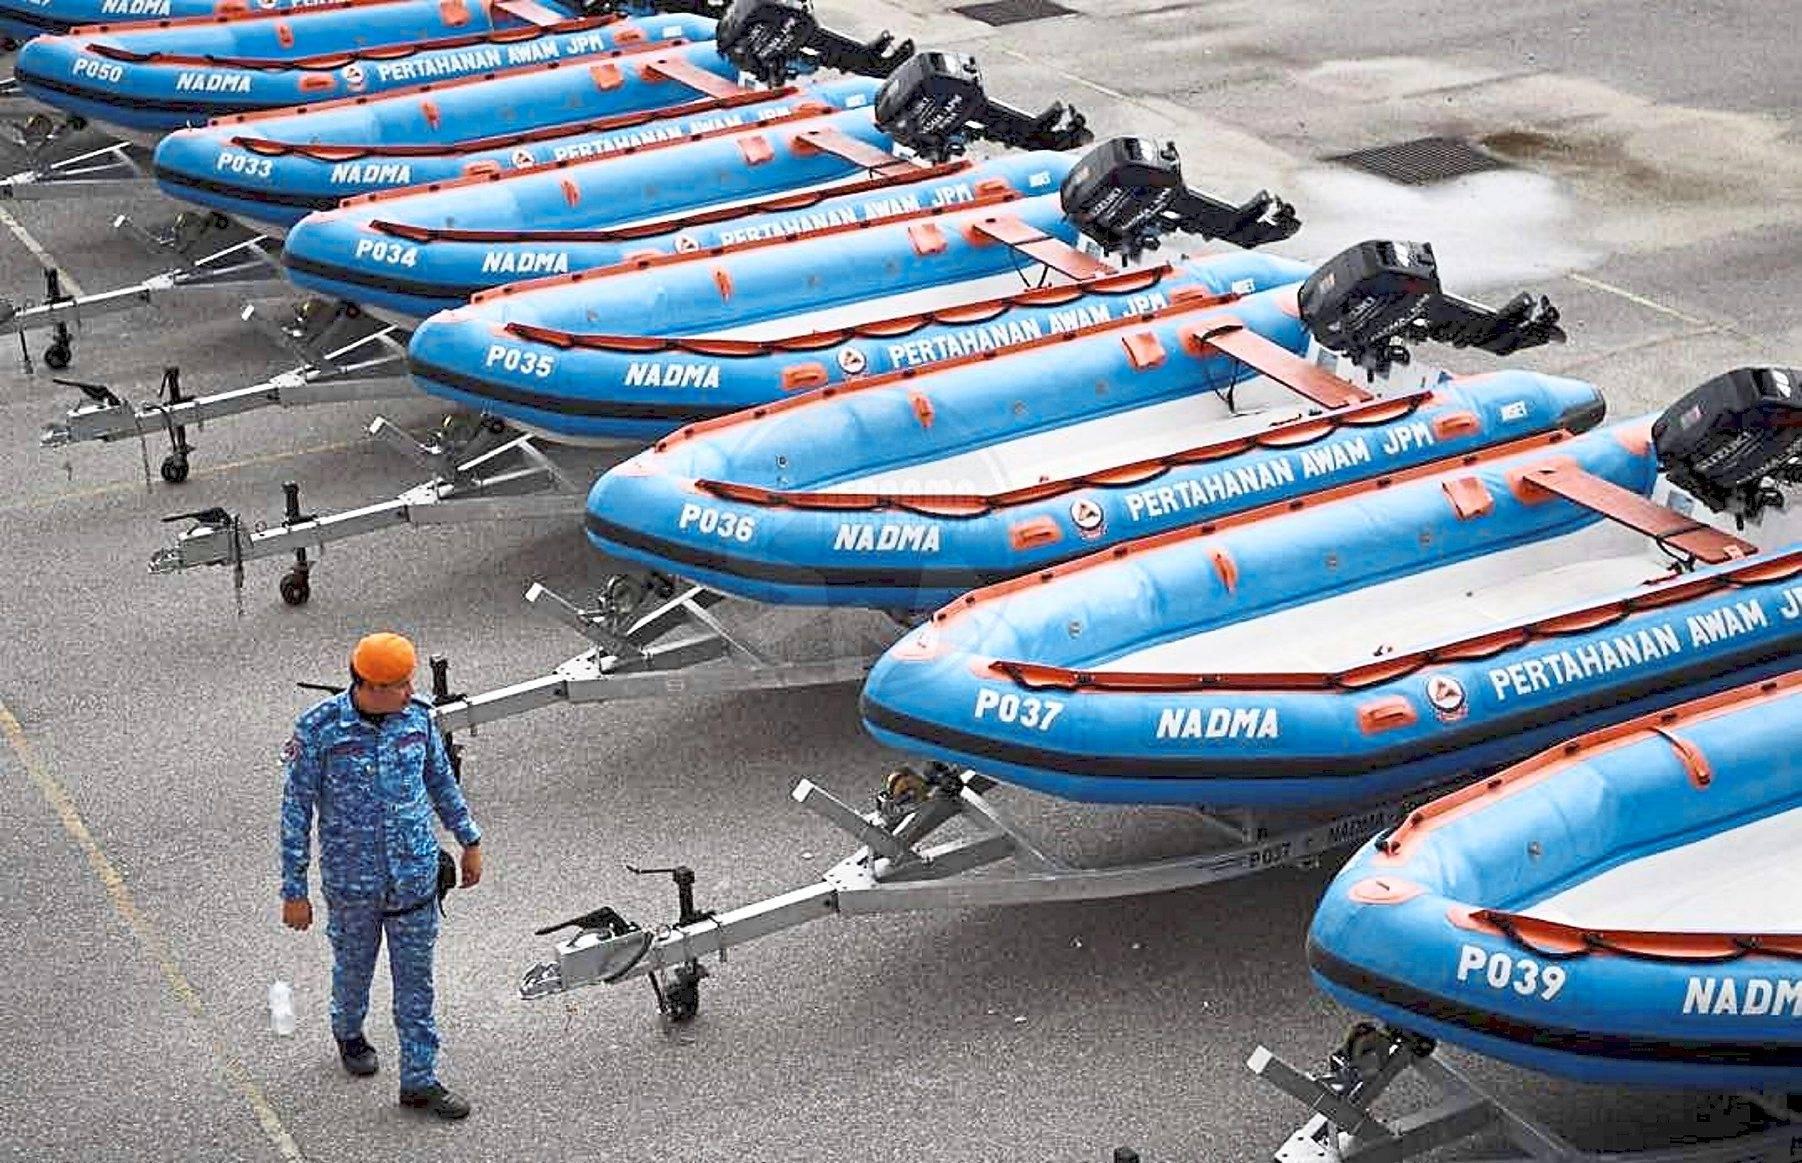 Rescue personnel on standby for landas season